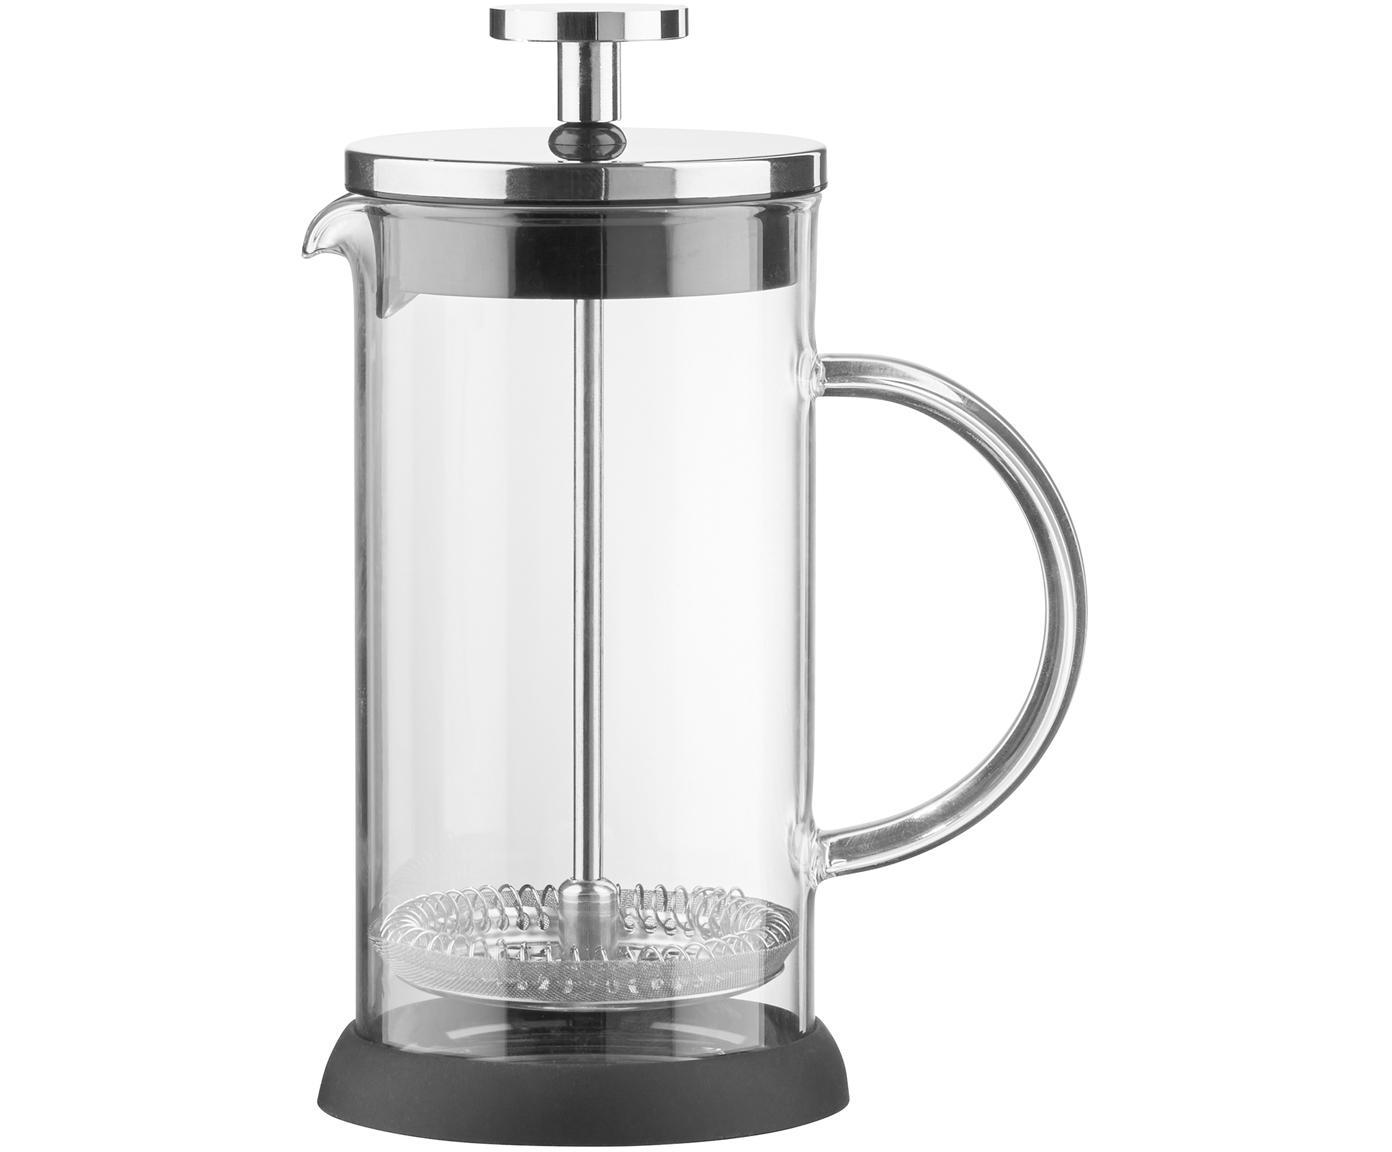 Koffiemaker Beata, Borosilicaatglas, edelstaal, polypropyleen, siliconen, Transparant, edelstaalkleurig, zwart, Ø 14 x H 22 cm